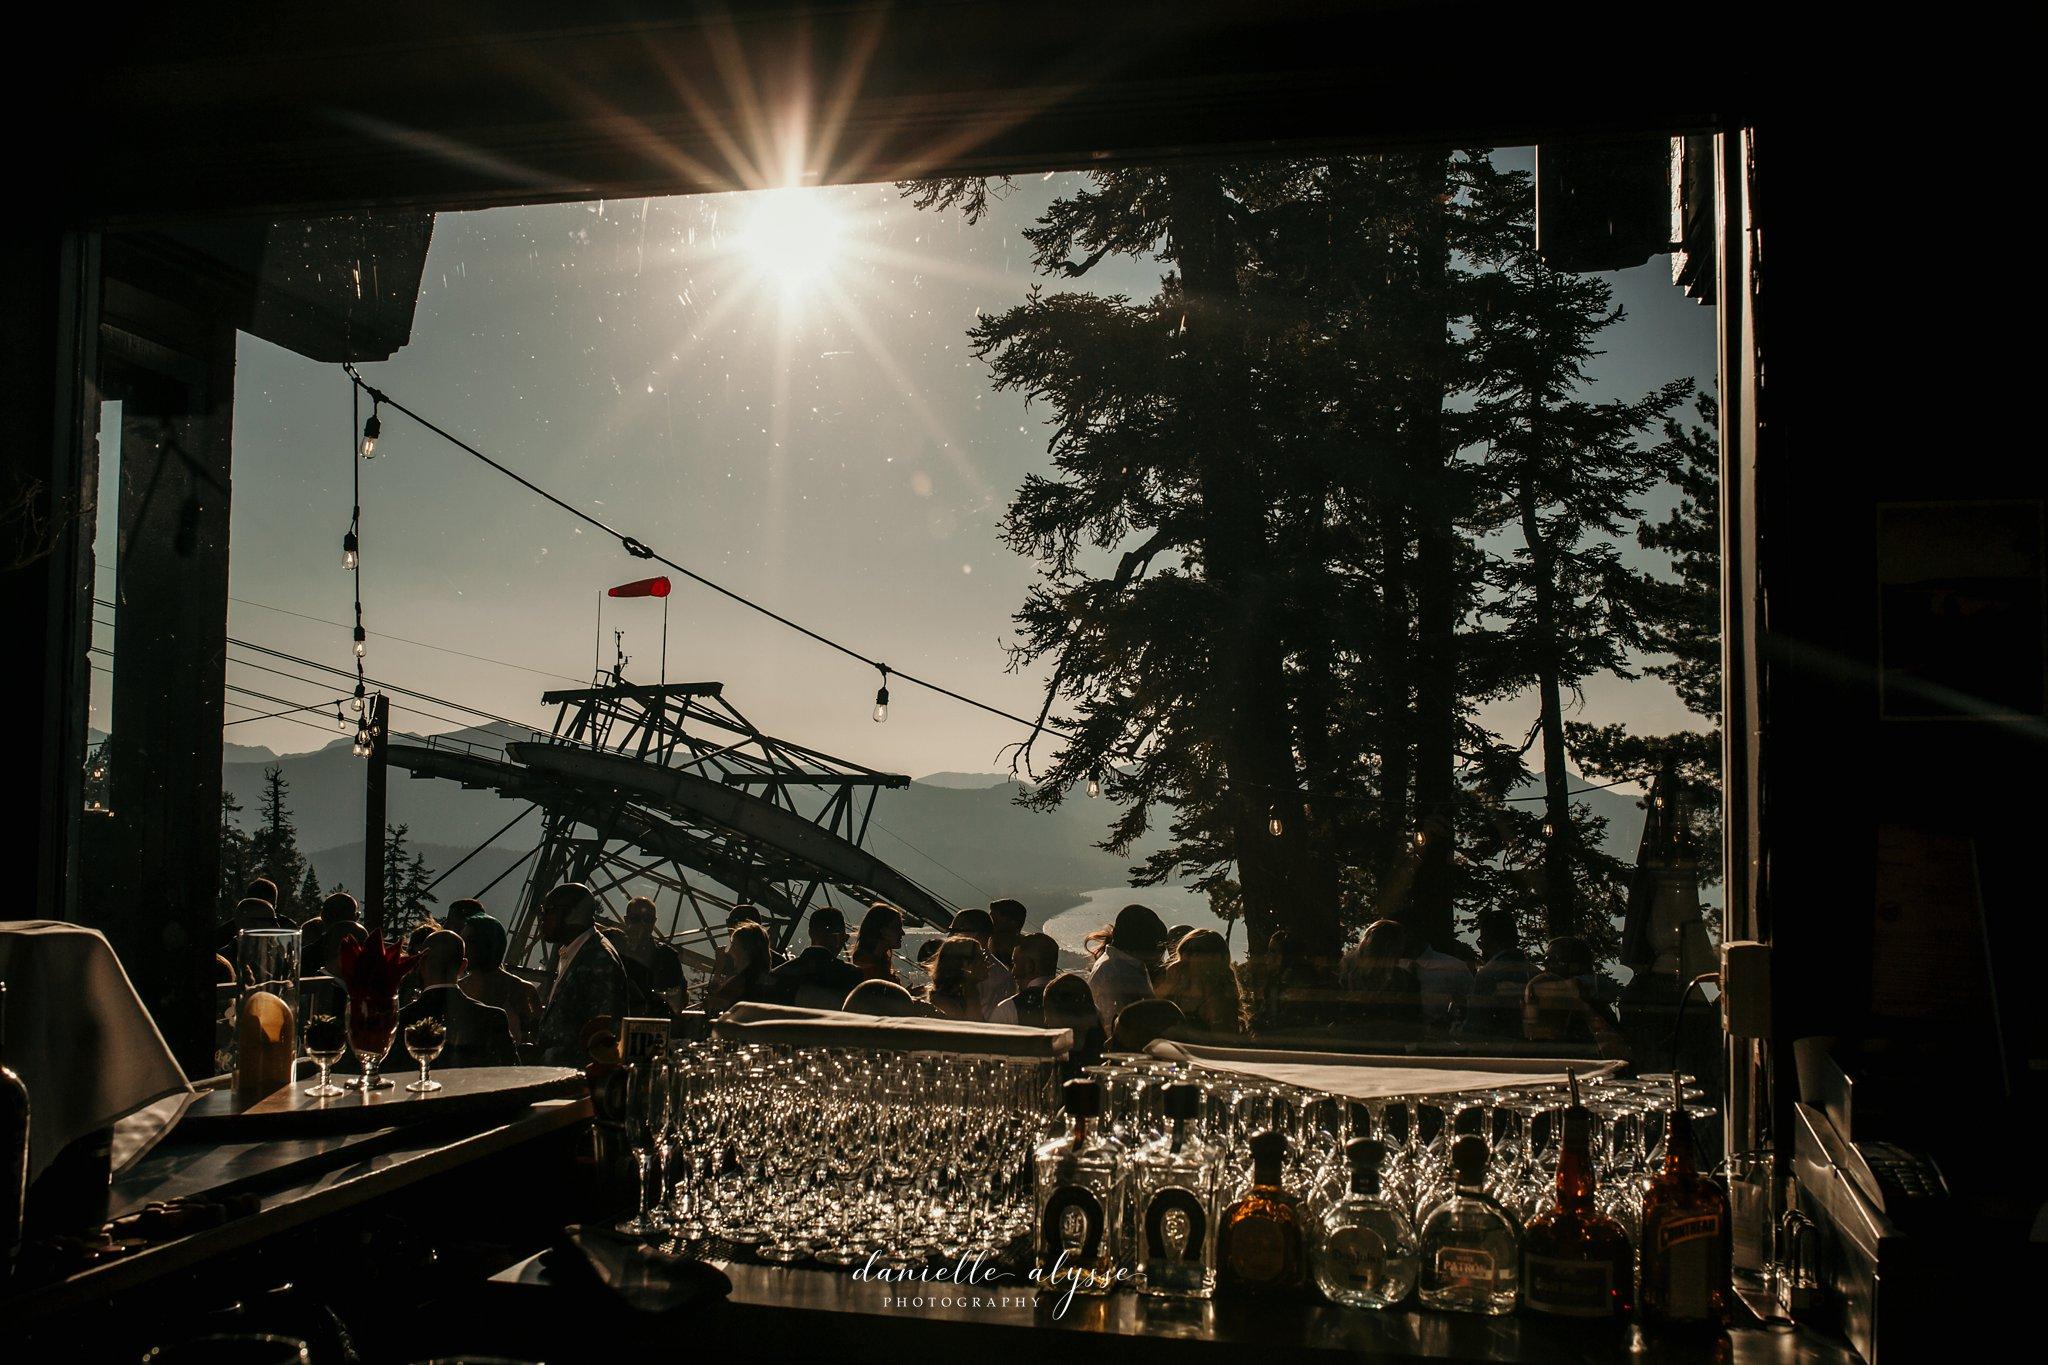 180831_wedding_stephanie_heavenly_south_lake_tahoe_danielle_alysse_photography_destination_blog_882_WEB.jpg